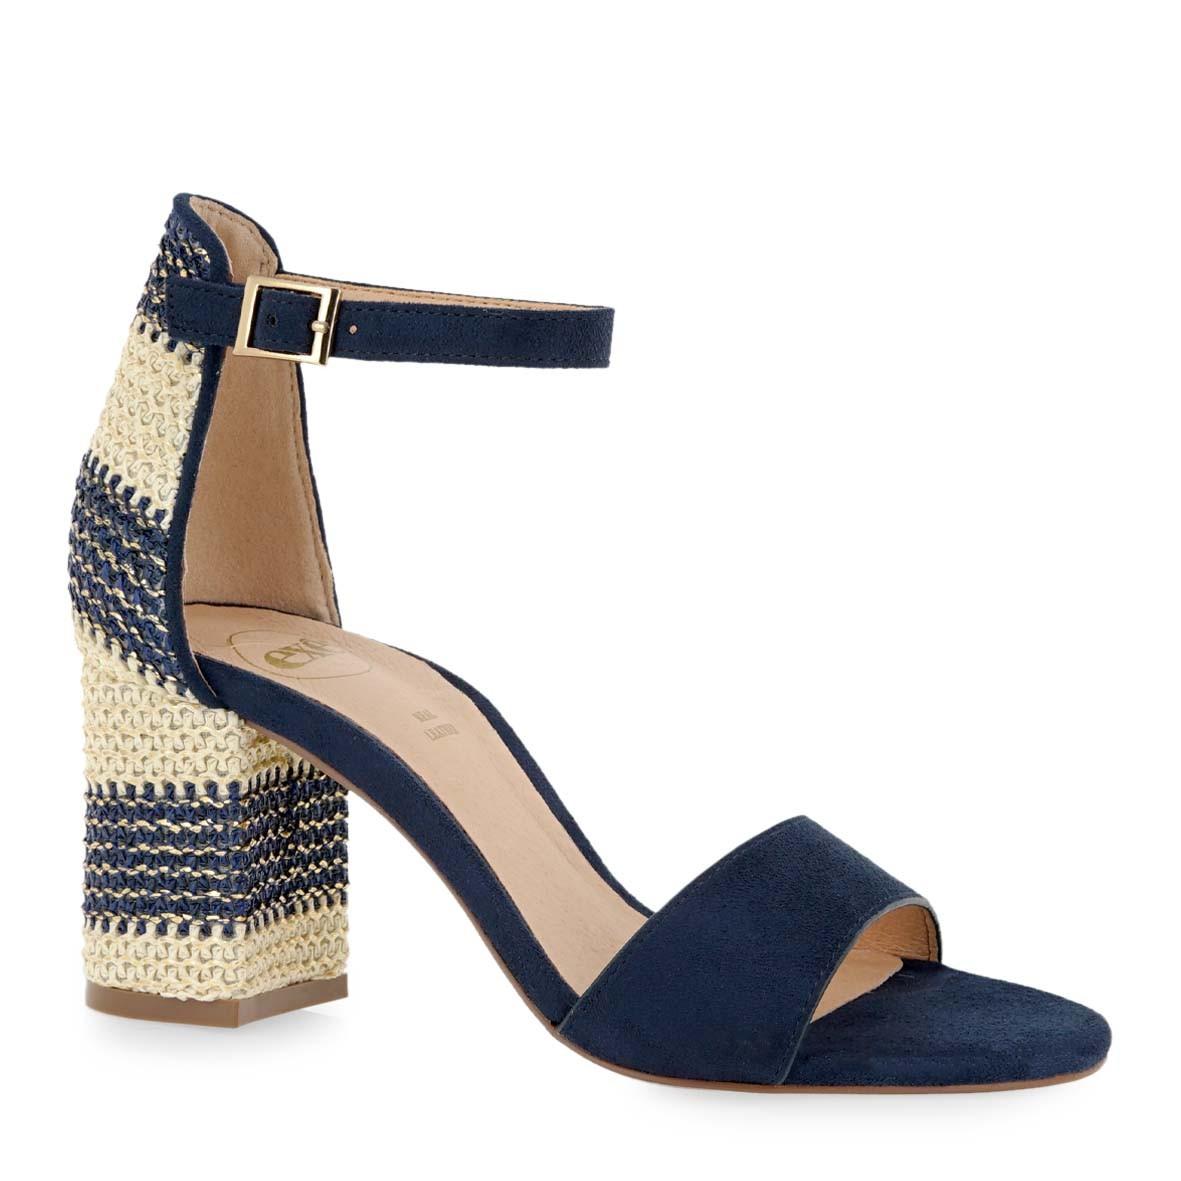 EXE Shoes Πέδιλα Γυναικεία ADELLE-622 Μπλέ Καστόρι K47006224054